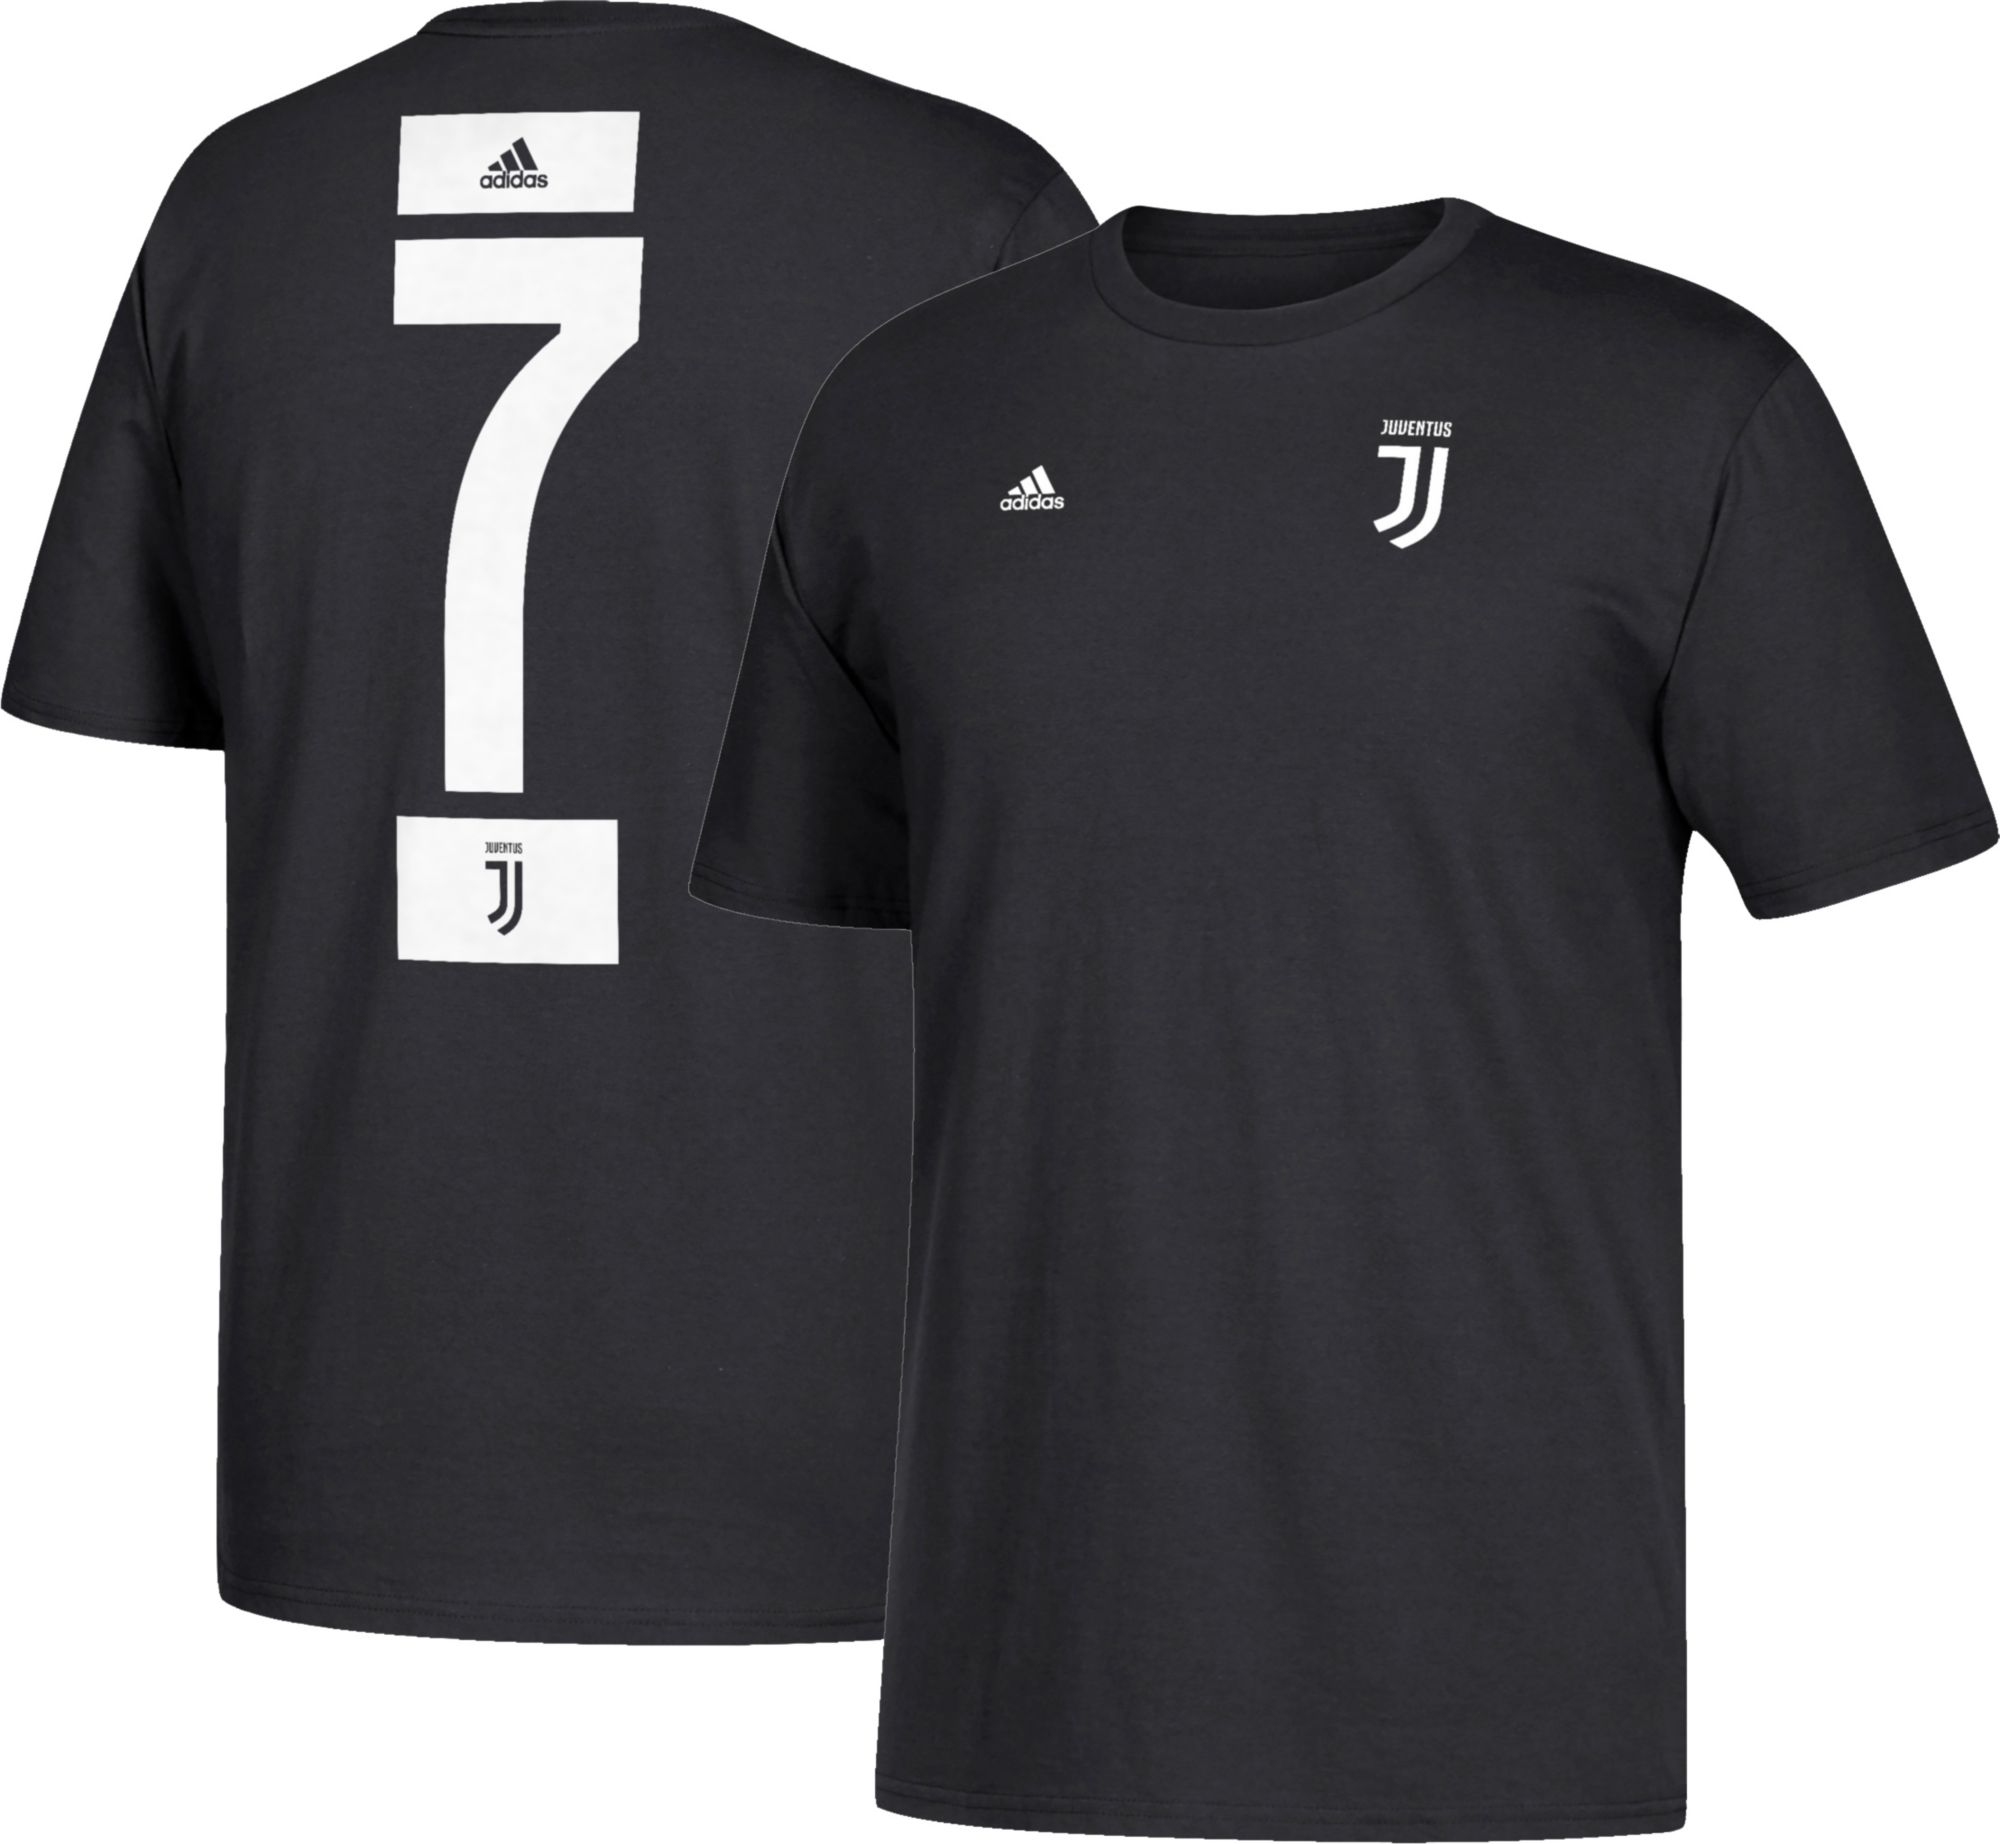 size 40 556dd a3fc5 adidas Men's Juventus Cristiano Ronaldo #7 Black Player T-Shirt